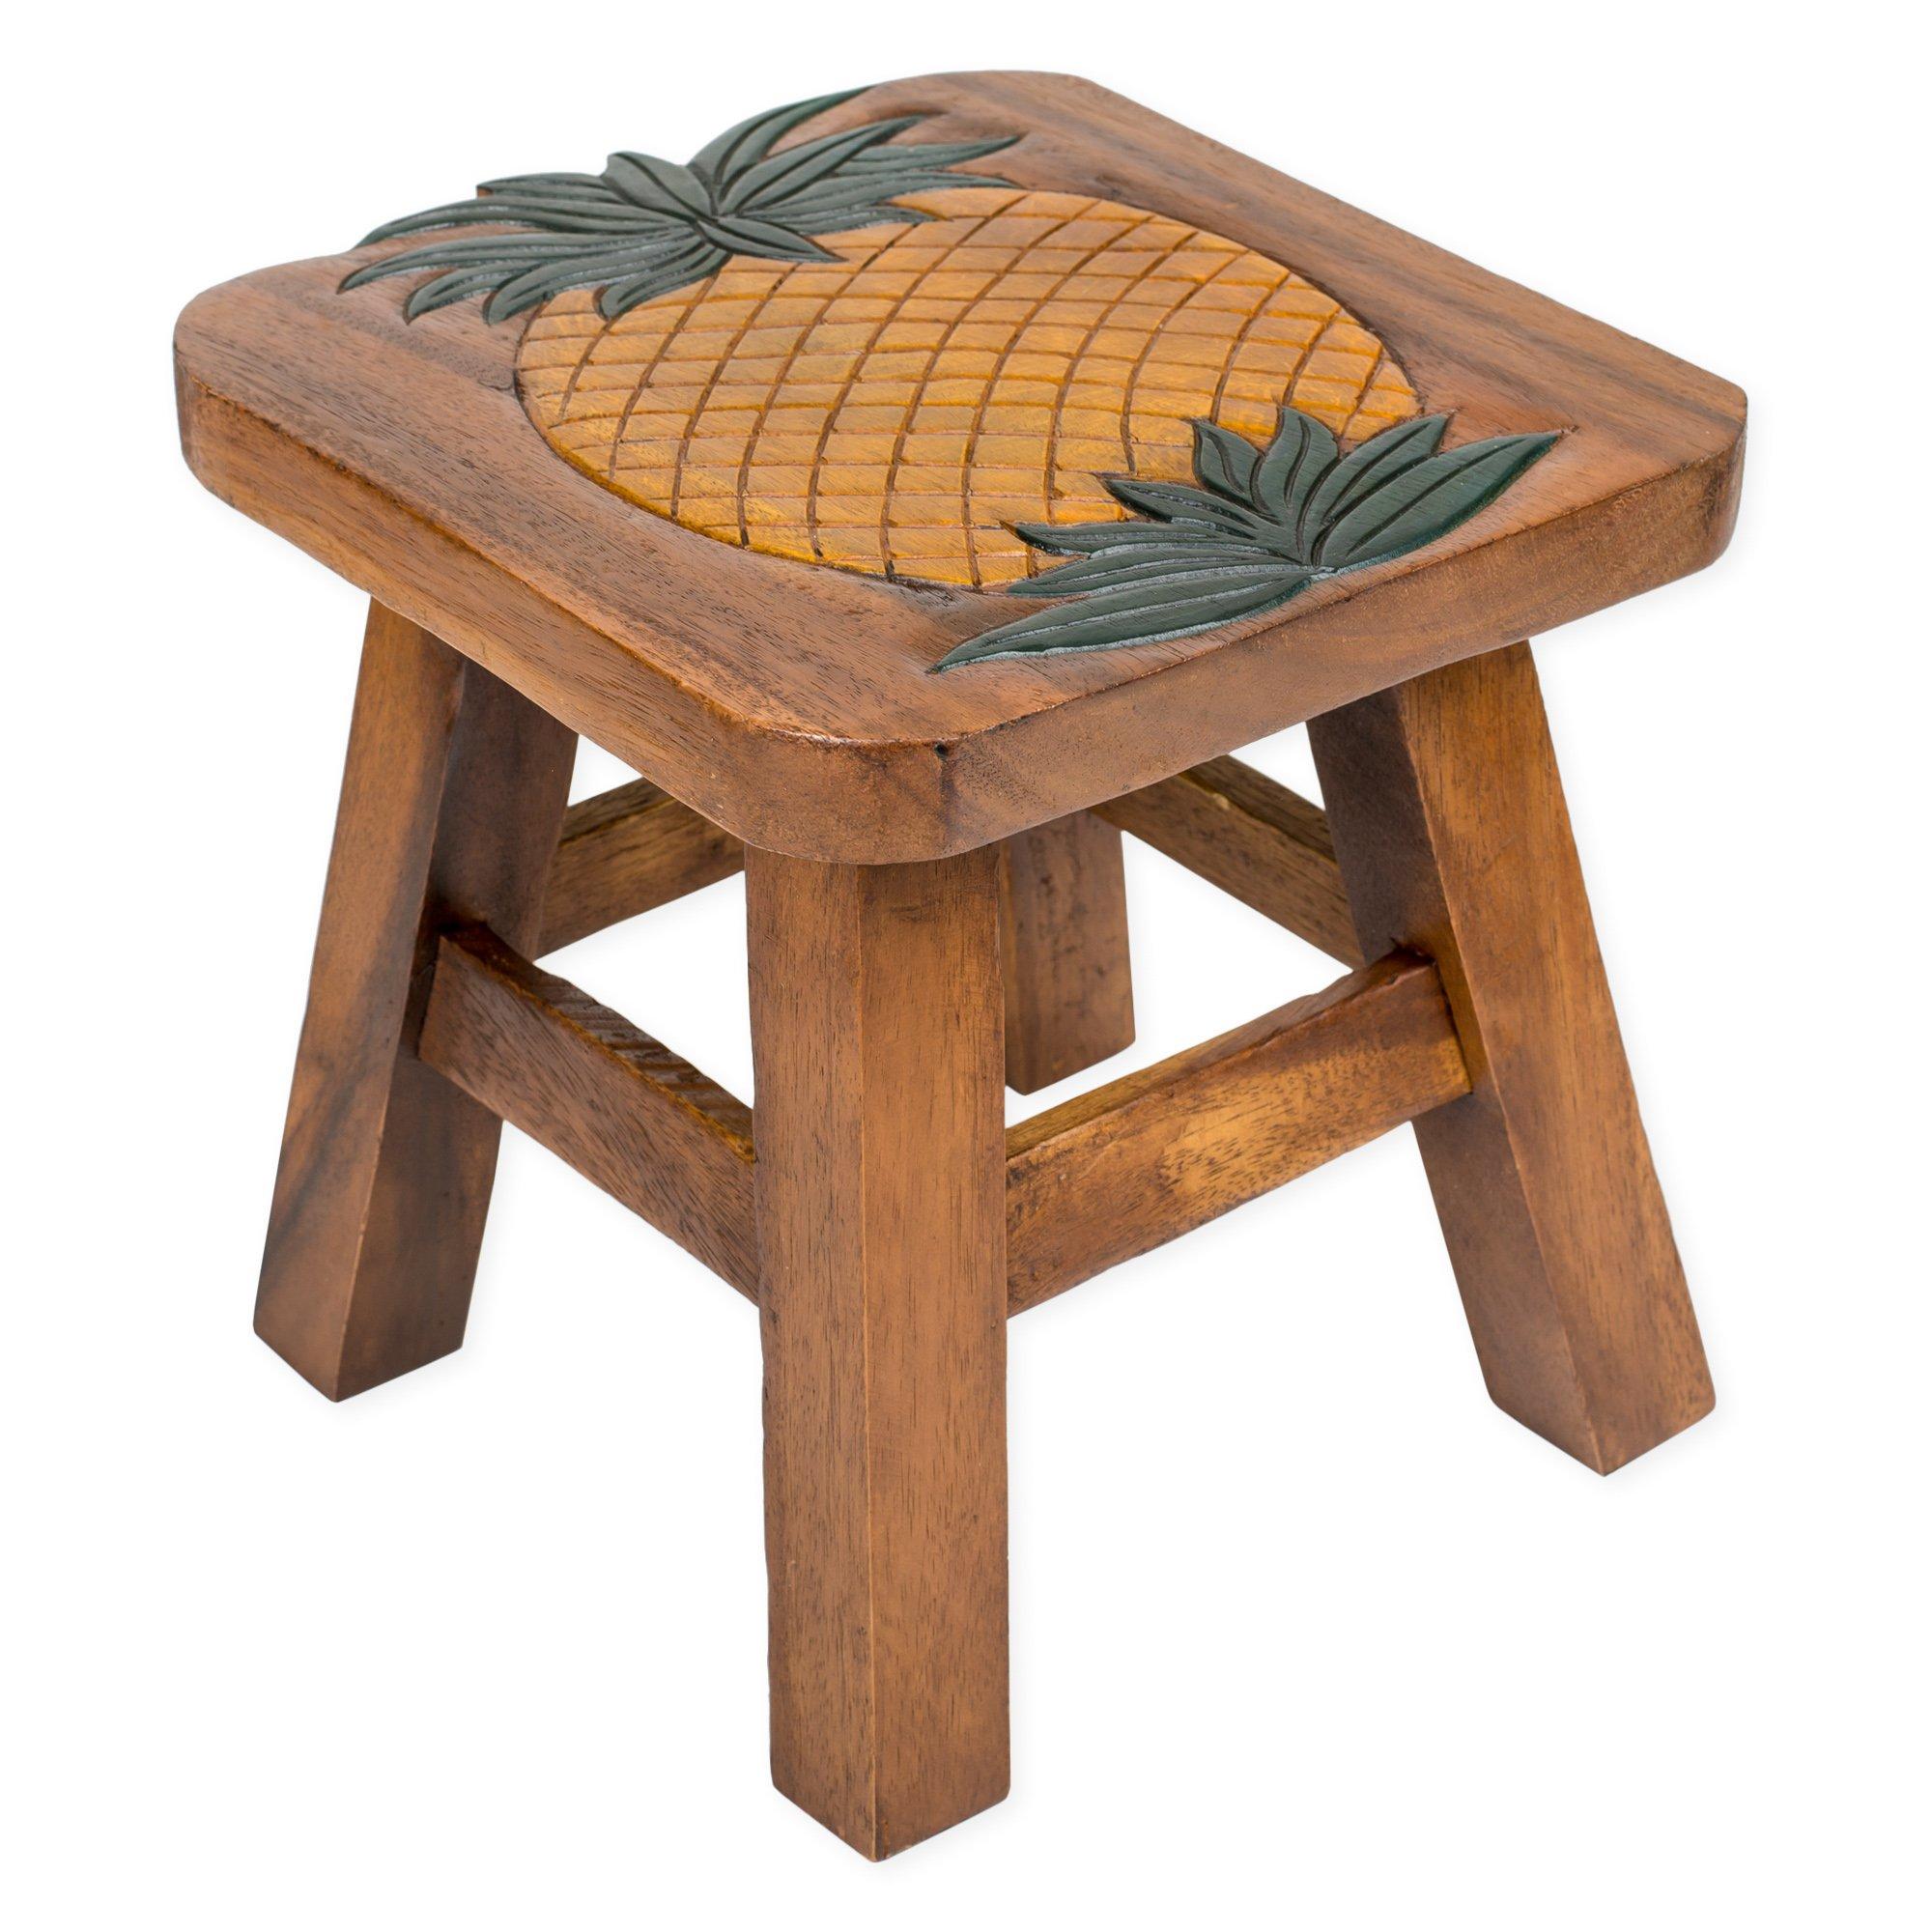 Pineapple Design Hand Carved Acacia Hardwood Decorative Short Stool